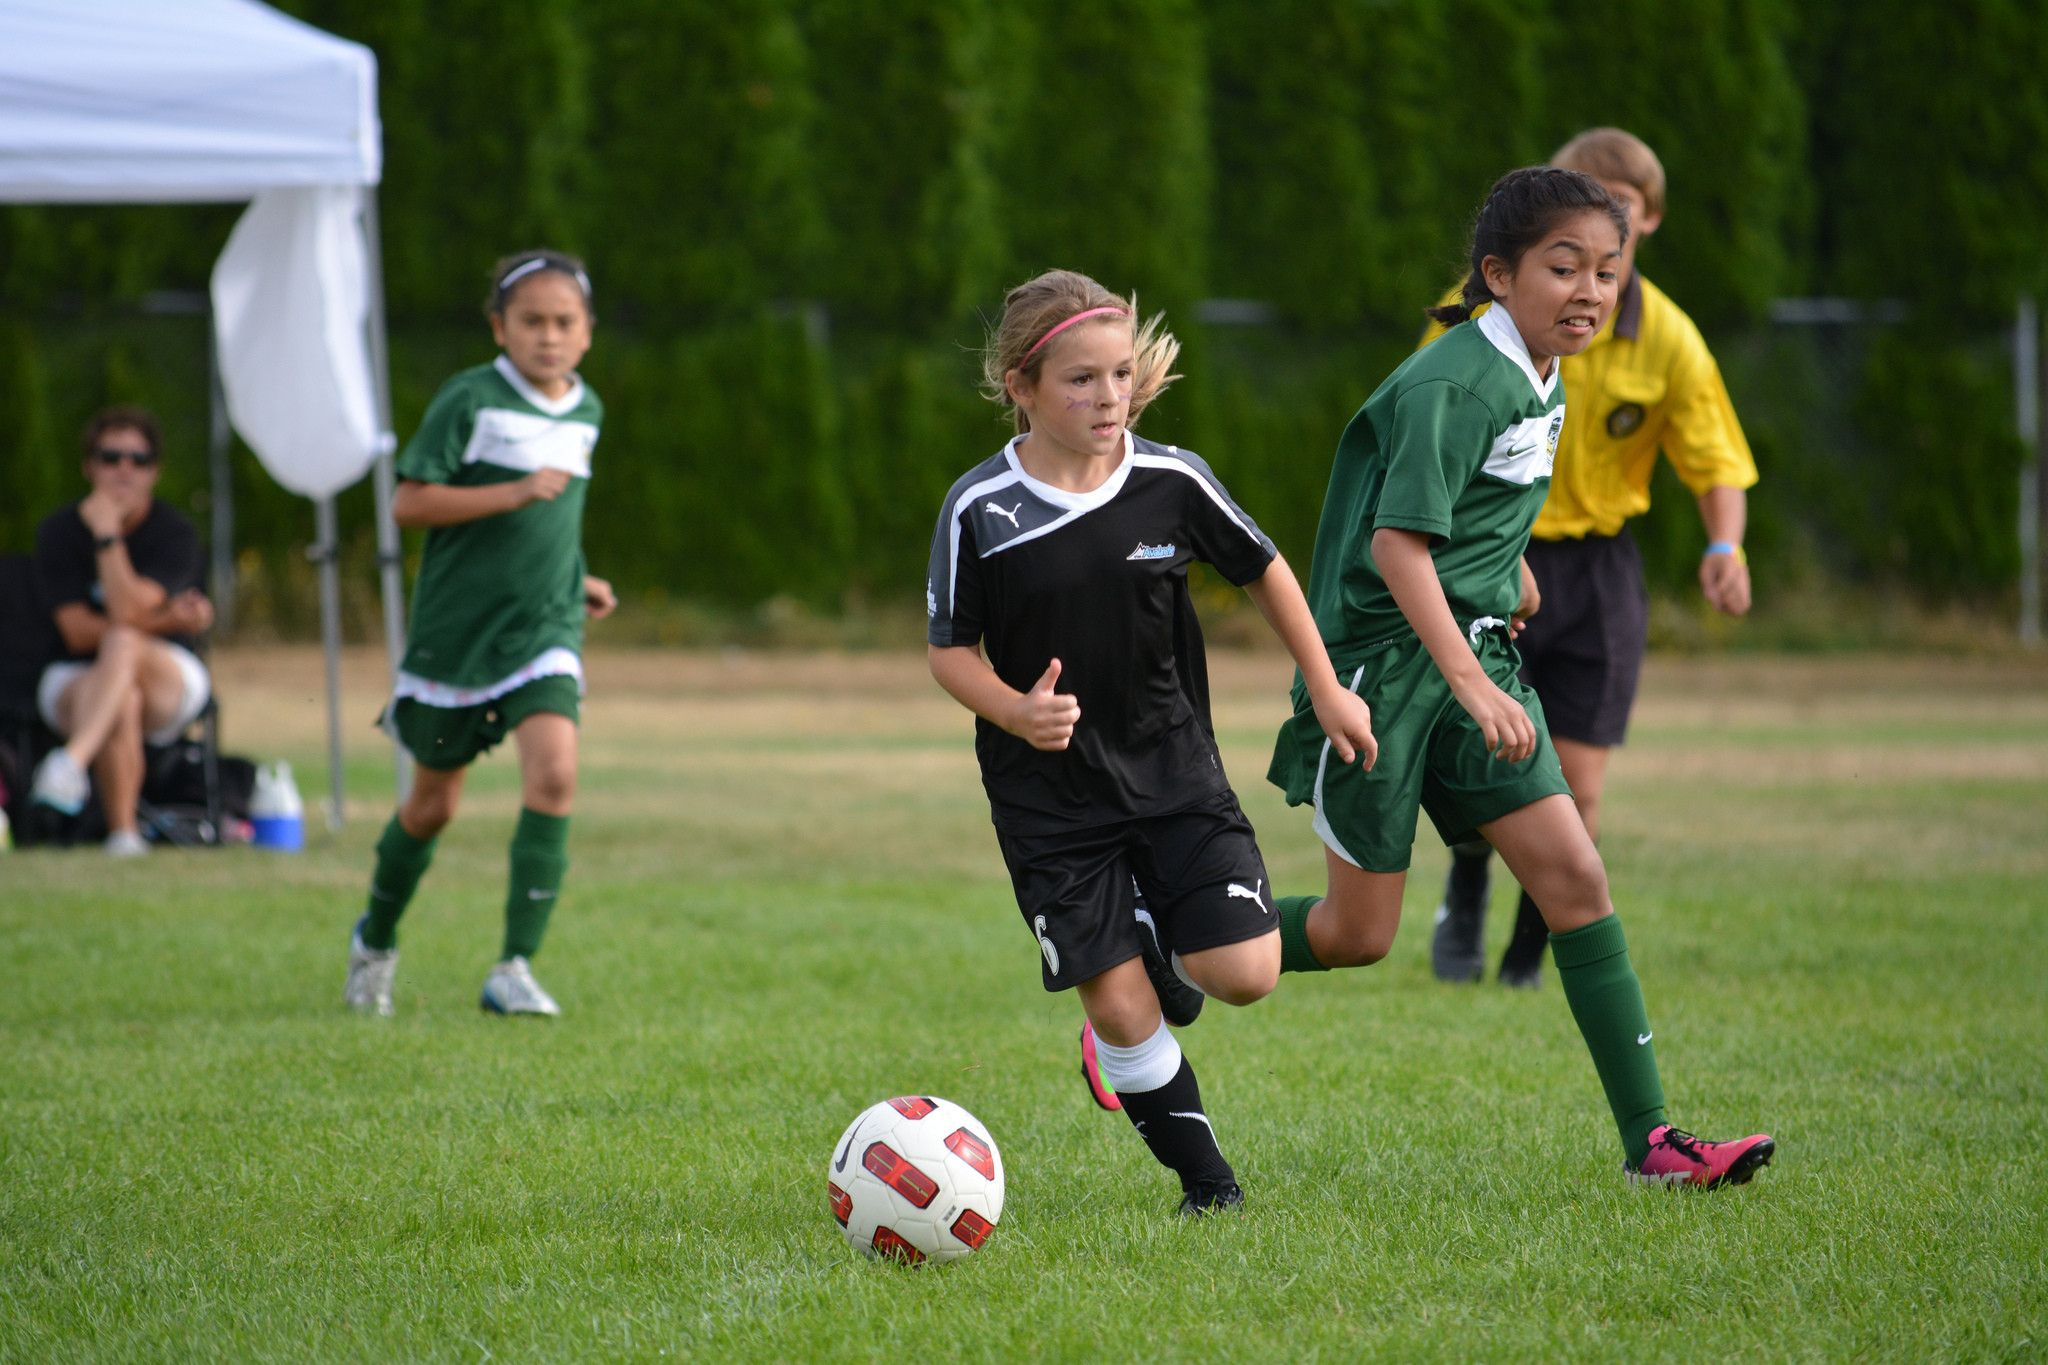 Girl Football Phenom Quits Gridiron To Play Soccer Girls Playing Football Fantasy Football Shirt Girl Playing Soccer